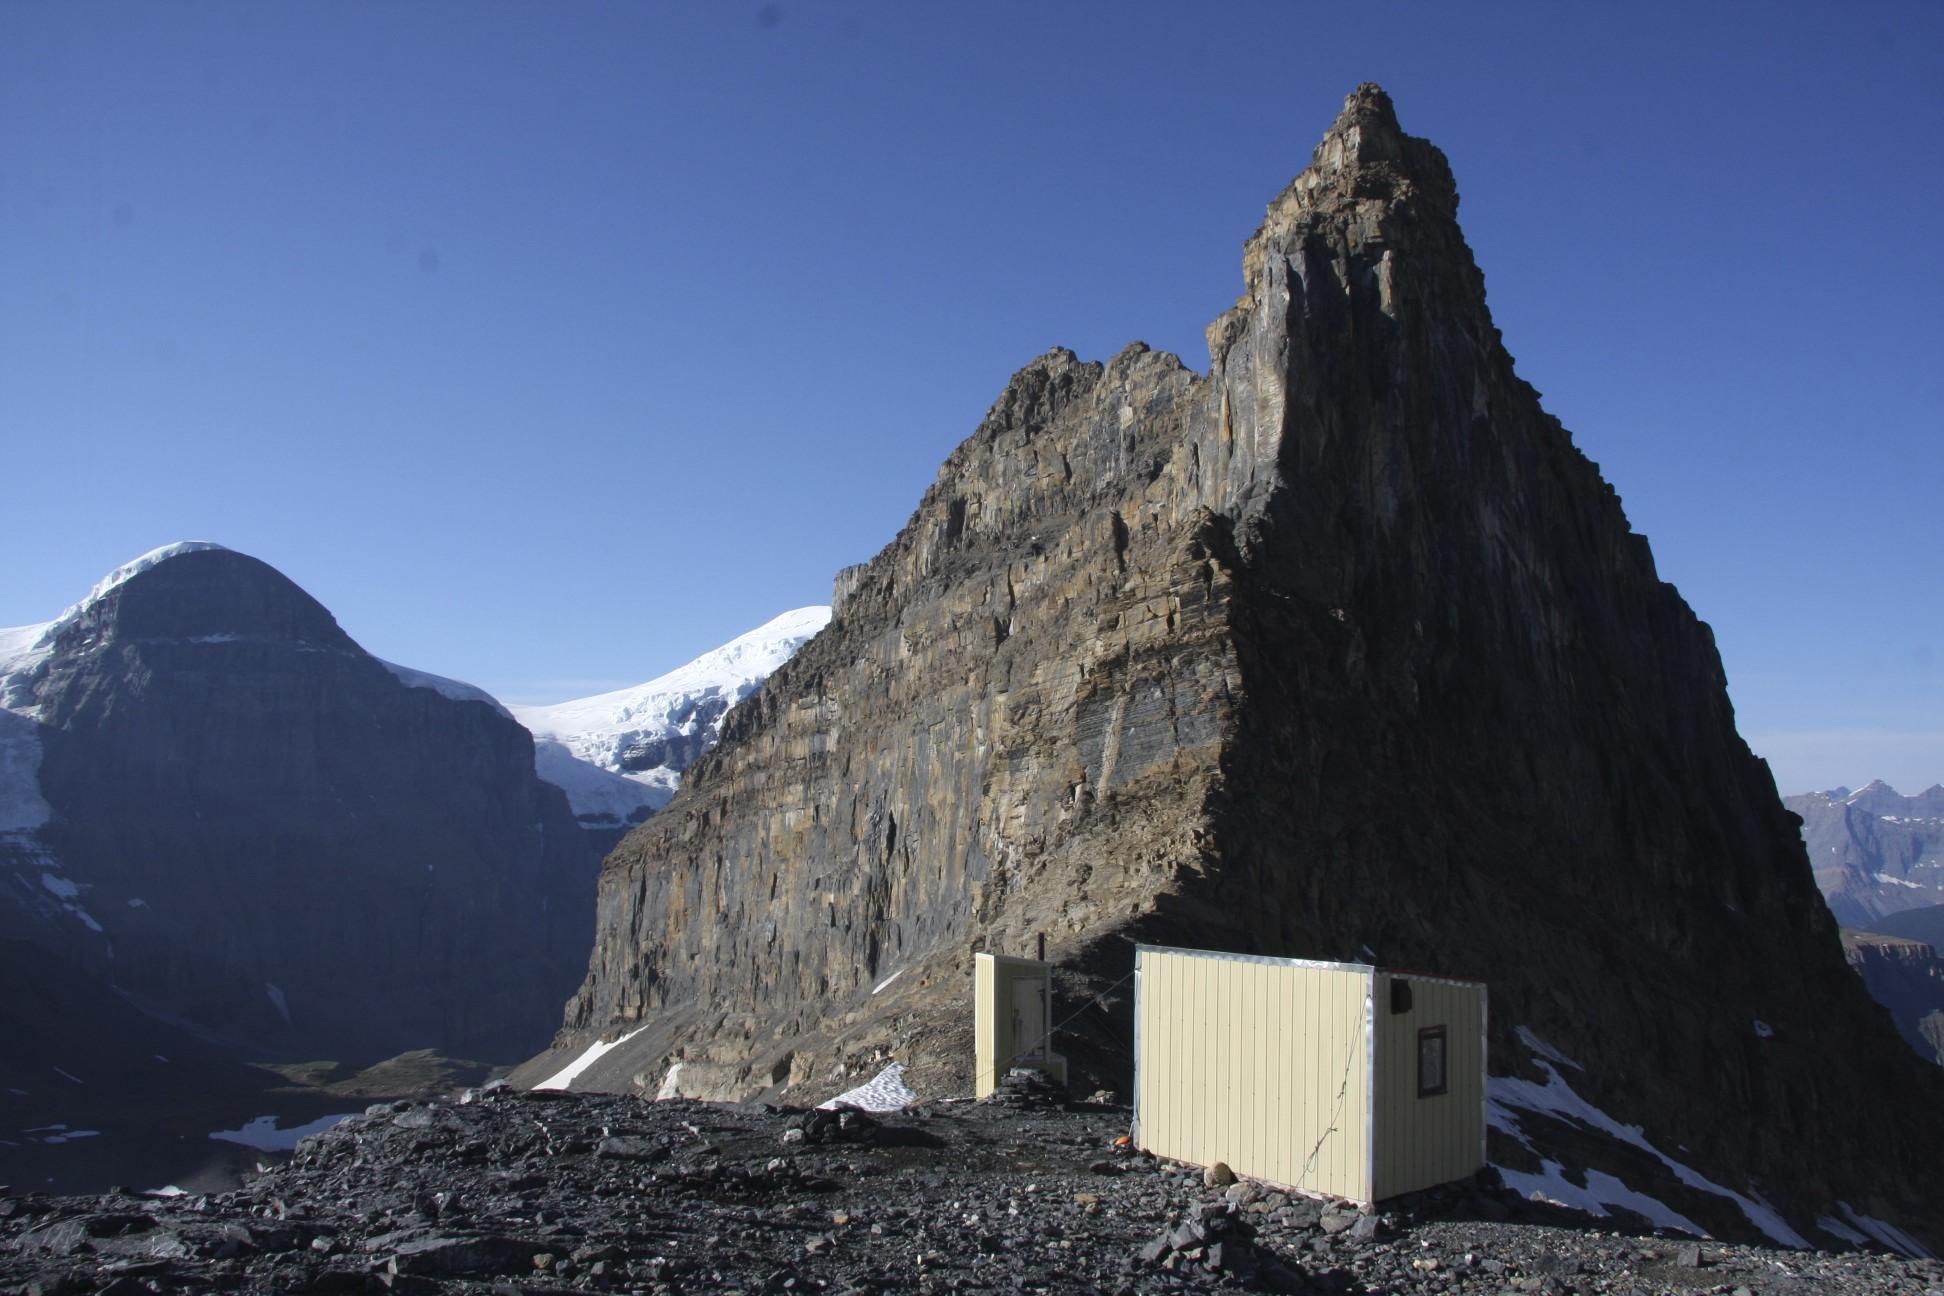 ACC hut in front ot Mt. Little Alberta